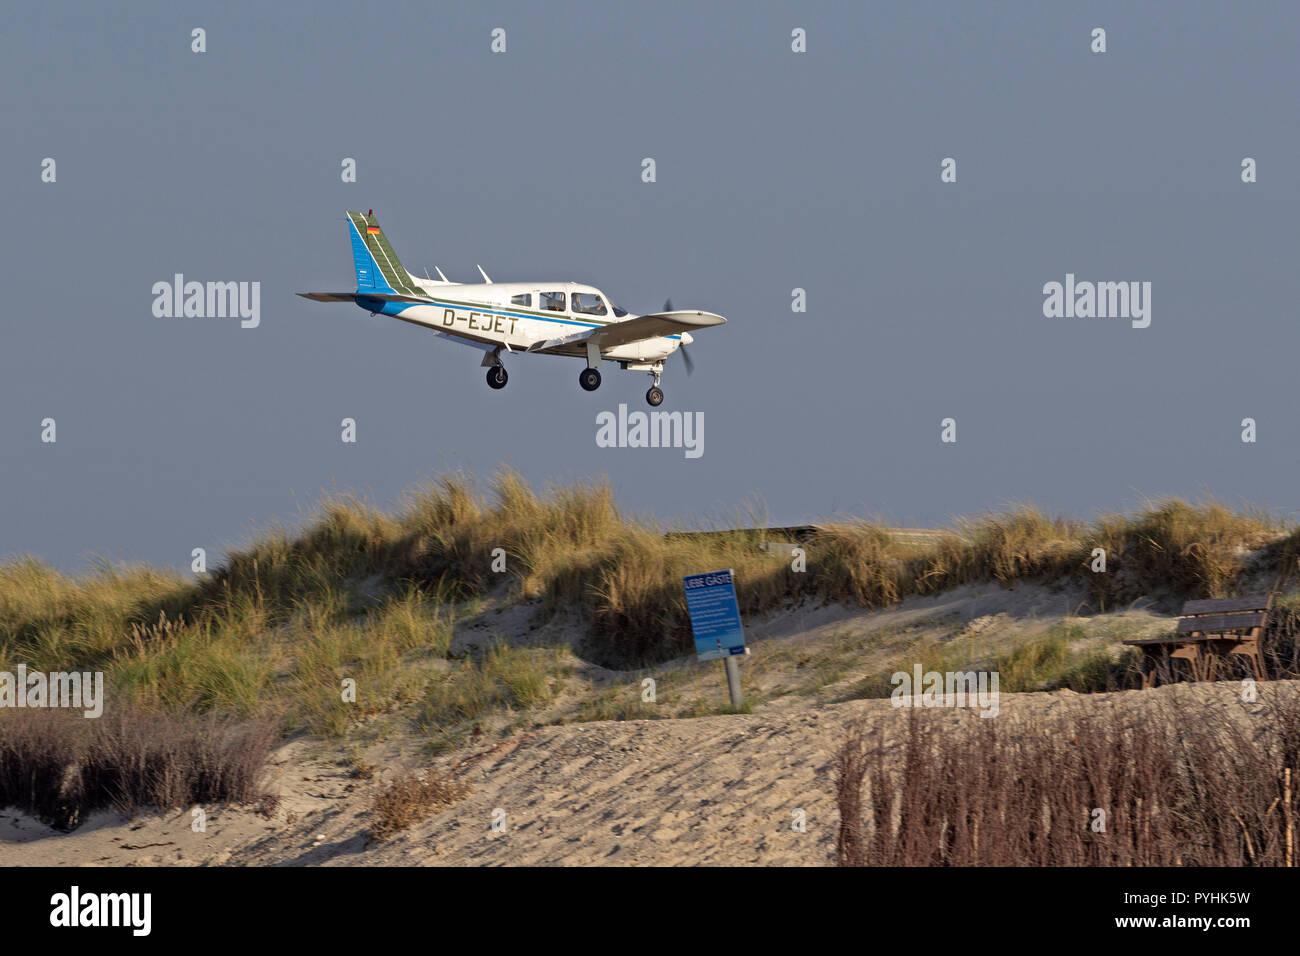 airplane landing, Dune, Heligoland, Schleswig-Holstein, Germany - Stock Image